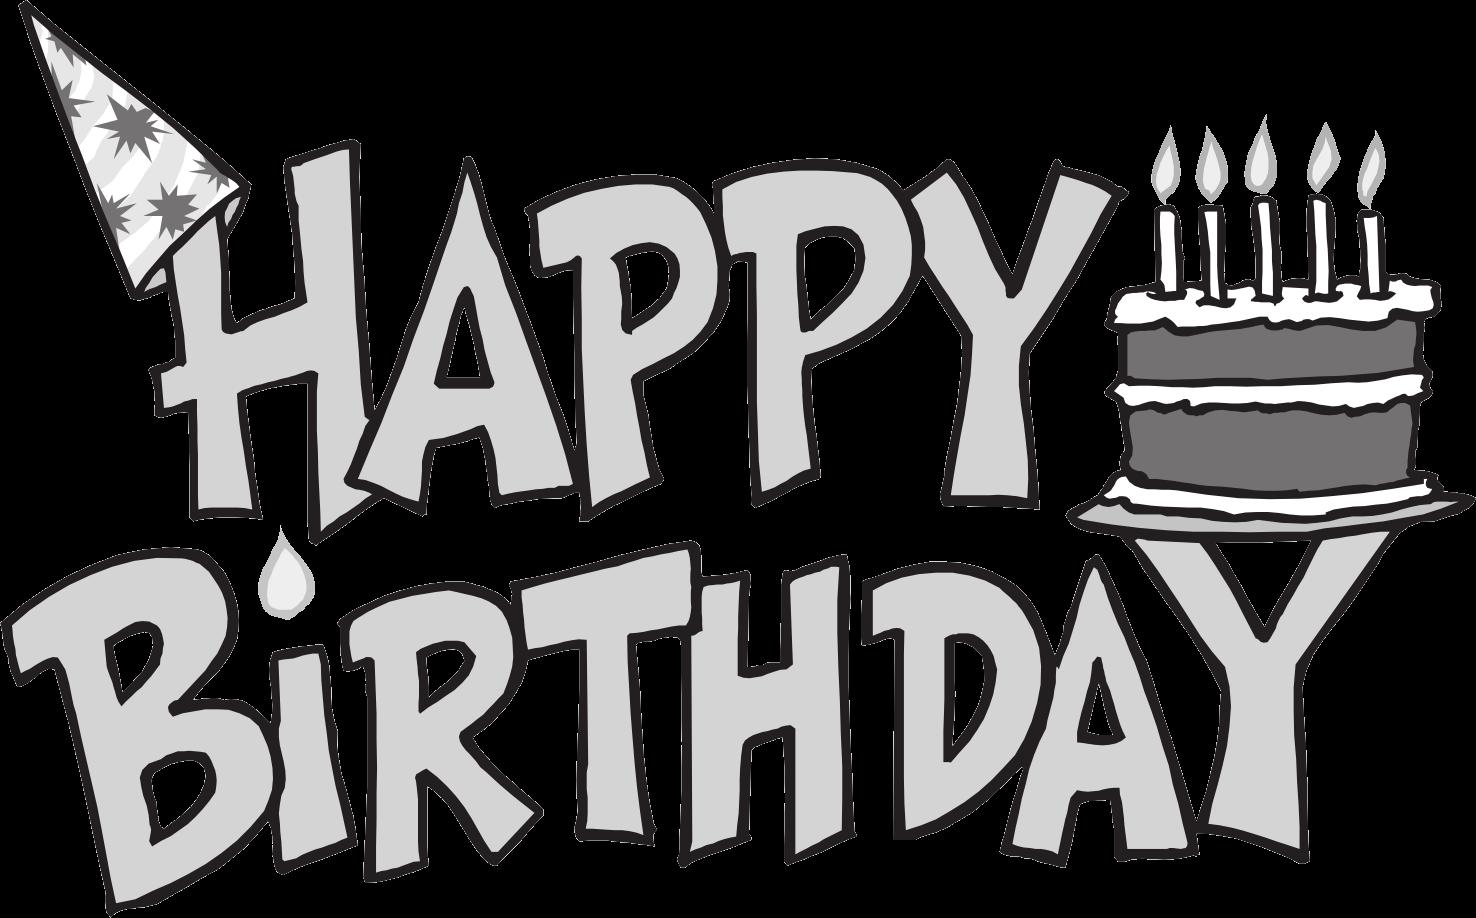 Birthday Black And White Happy Birthday -Birthday black and white happy birthday clipart black and white 4-17